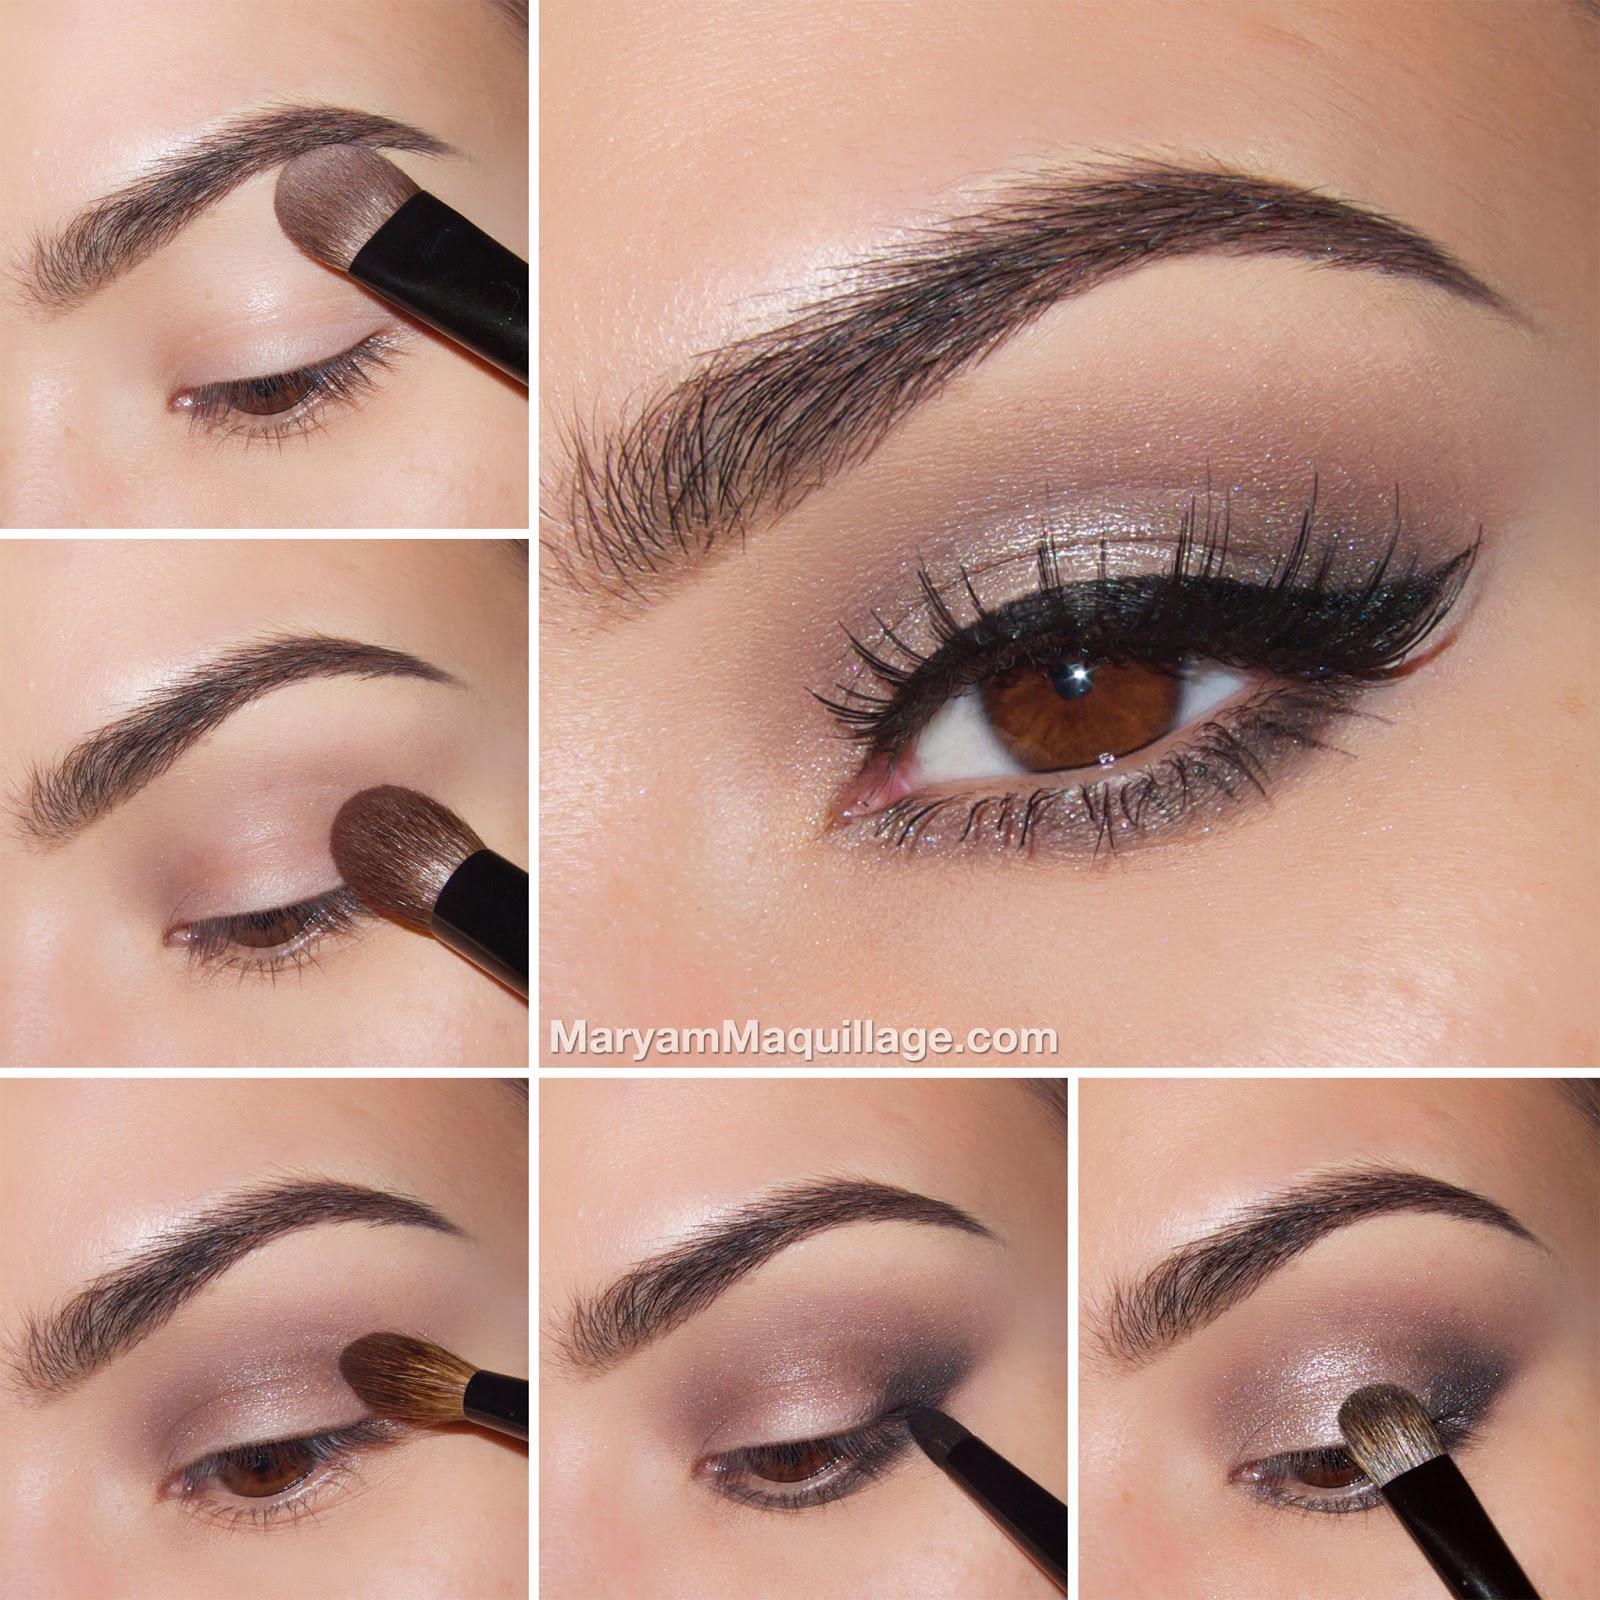 Maryam Maquillage Quot City Smokey Quot Makeup With Wayne Goss The Eye Set